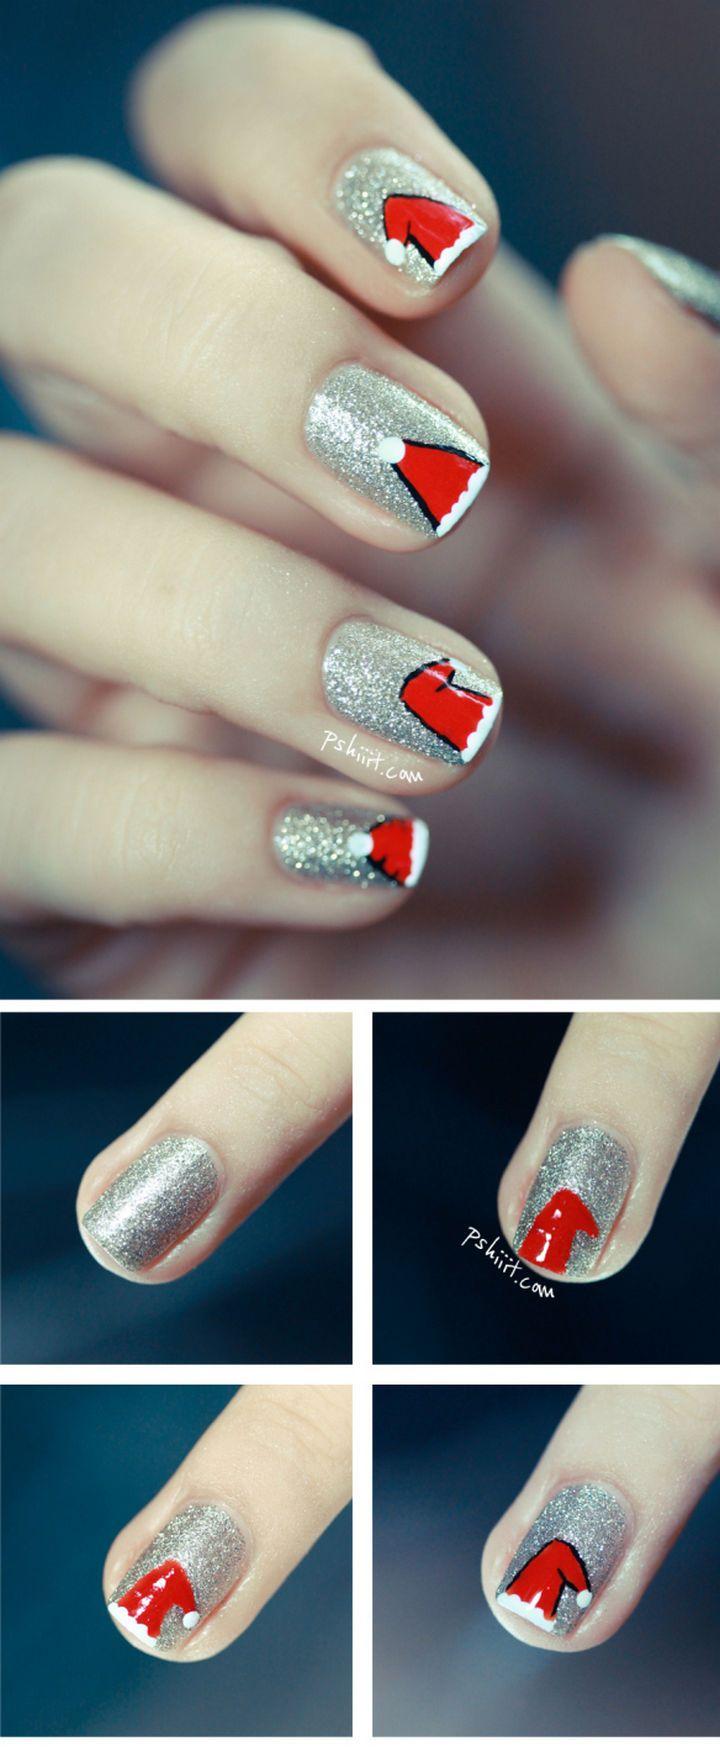 A variety of ideas for creating Santa Hat nails.